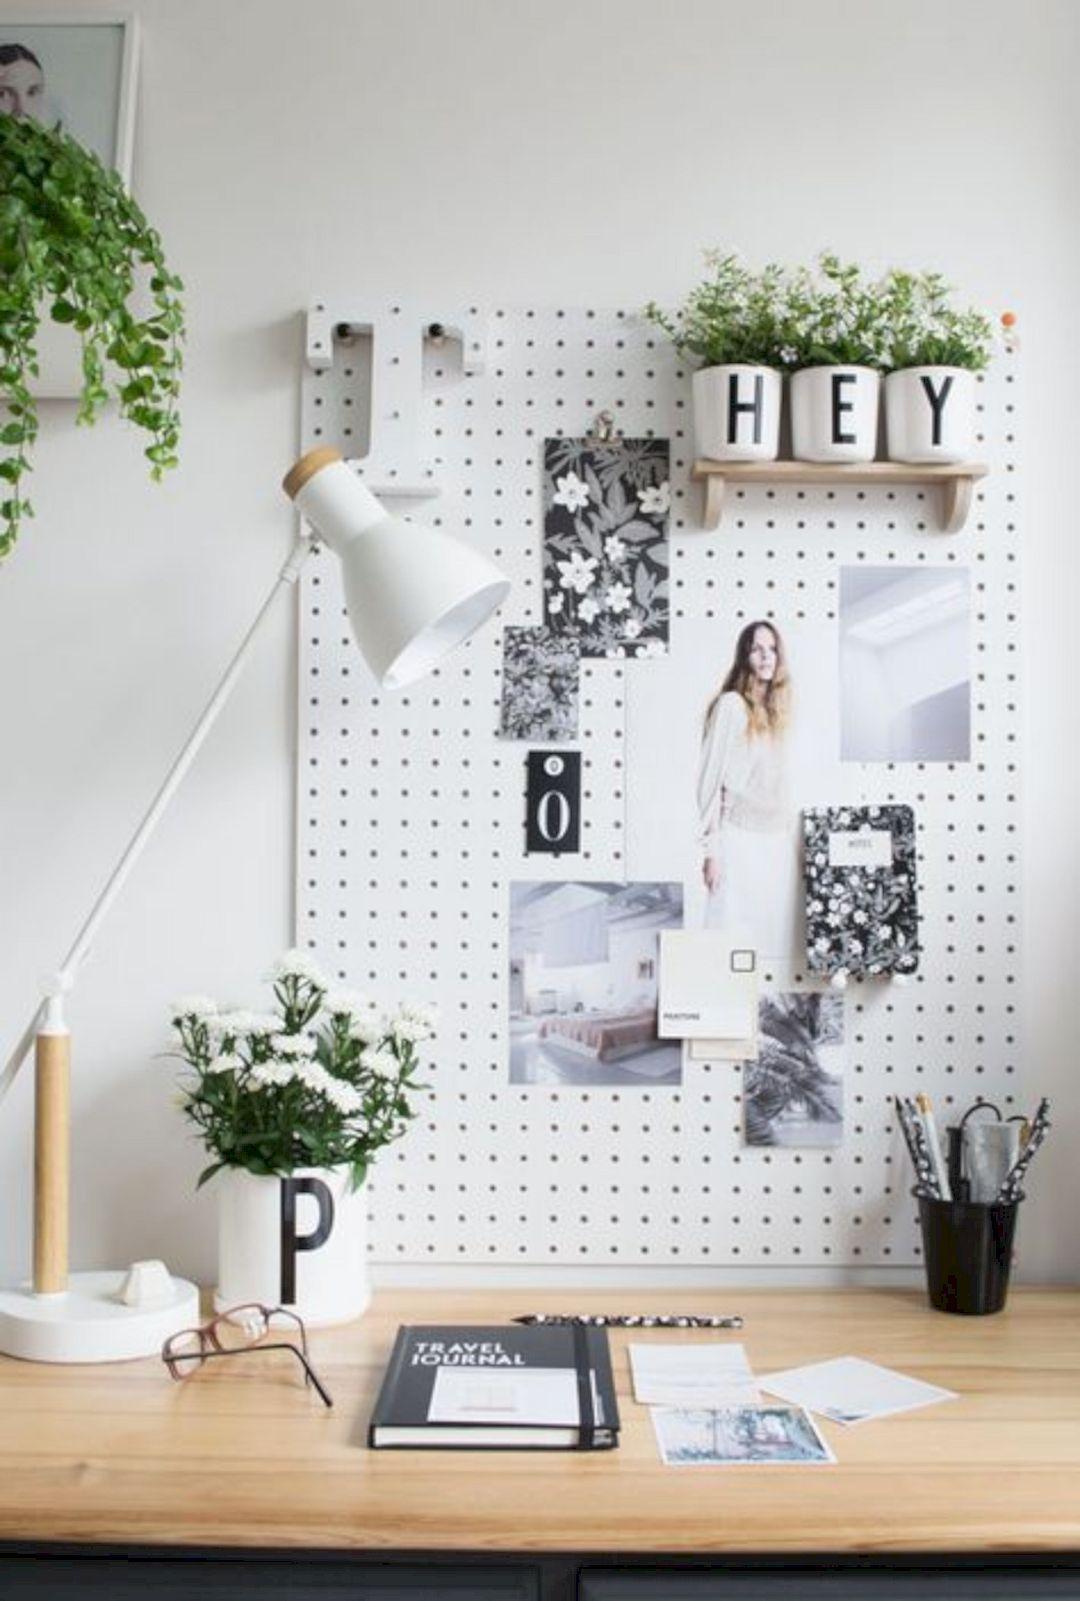 Fullsize Of Office Wall Decor